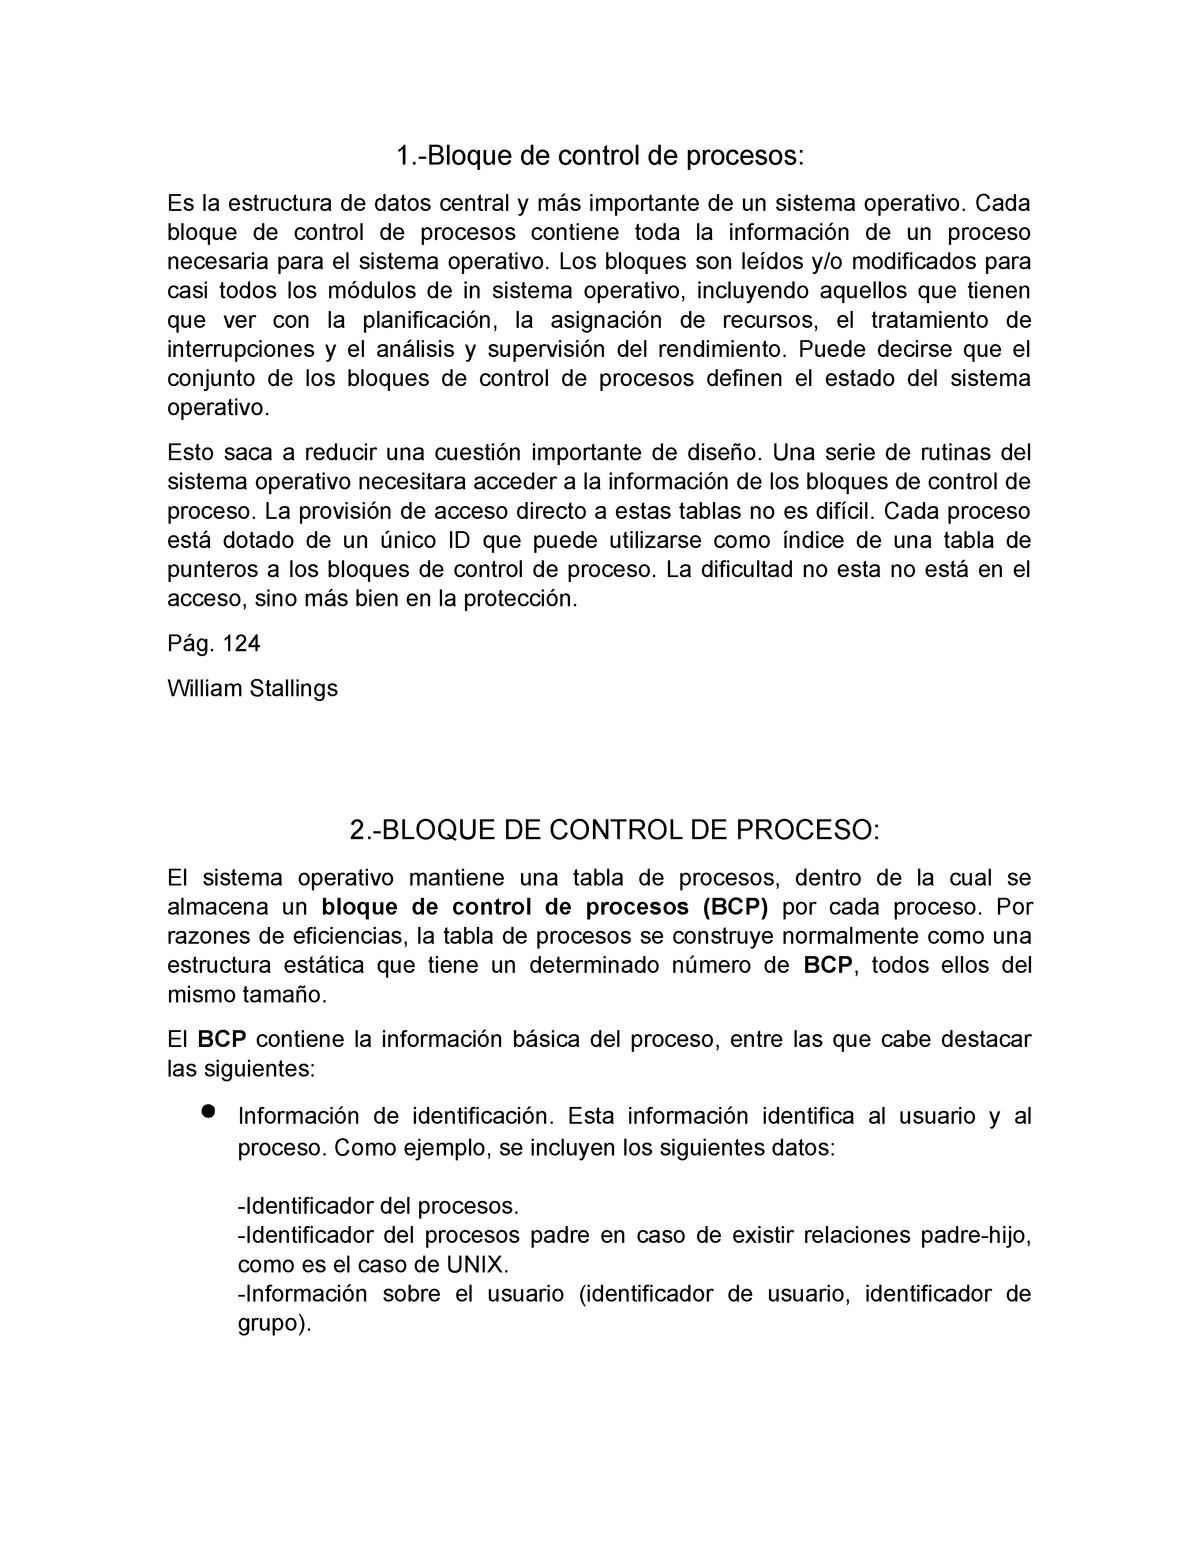 Bloque DE Control DE Proceso - Sistemas Operativos - UAN